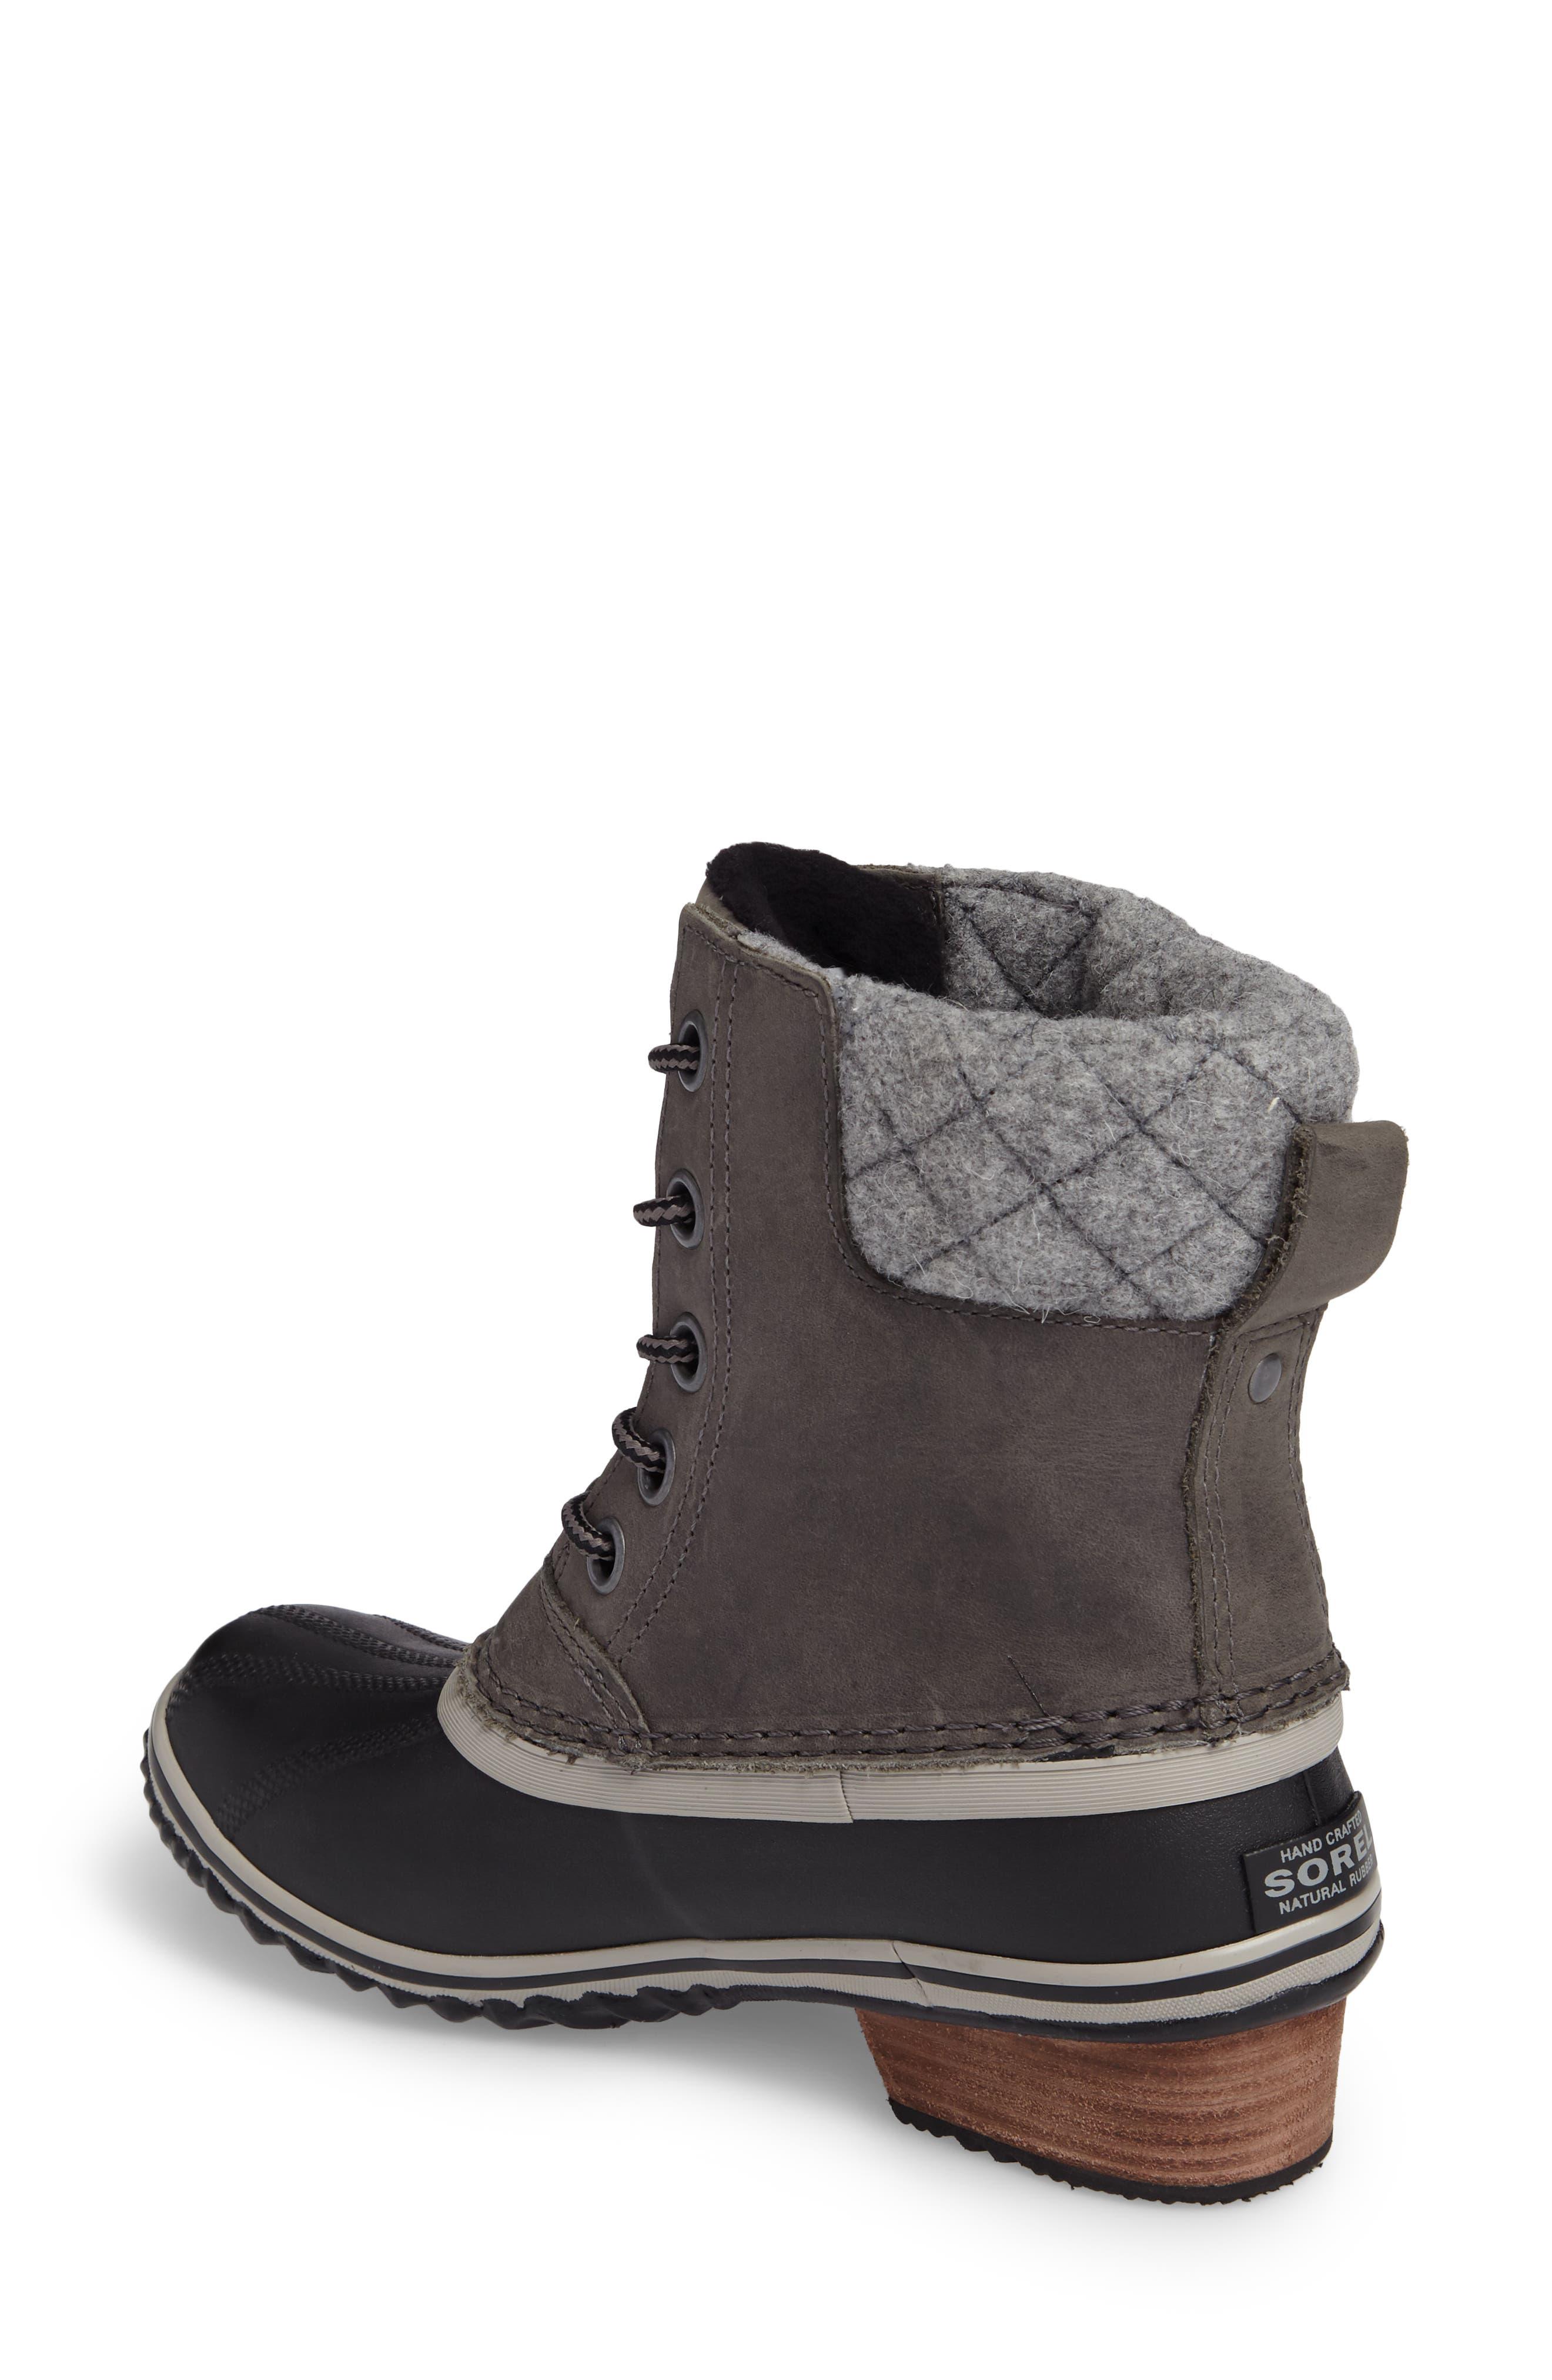 Slimpack II Waterproof Boot,                             Alternate thumbnail 2, color,                             Quarry/ Black